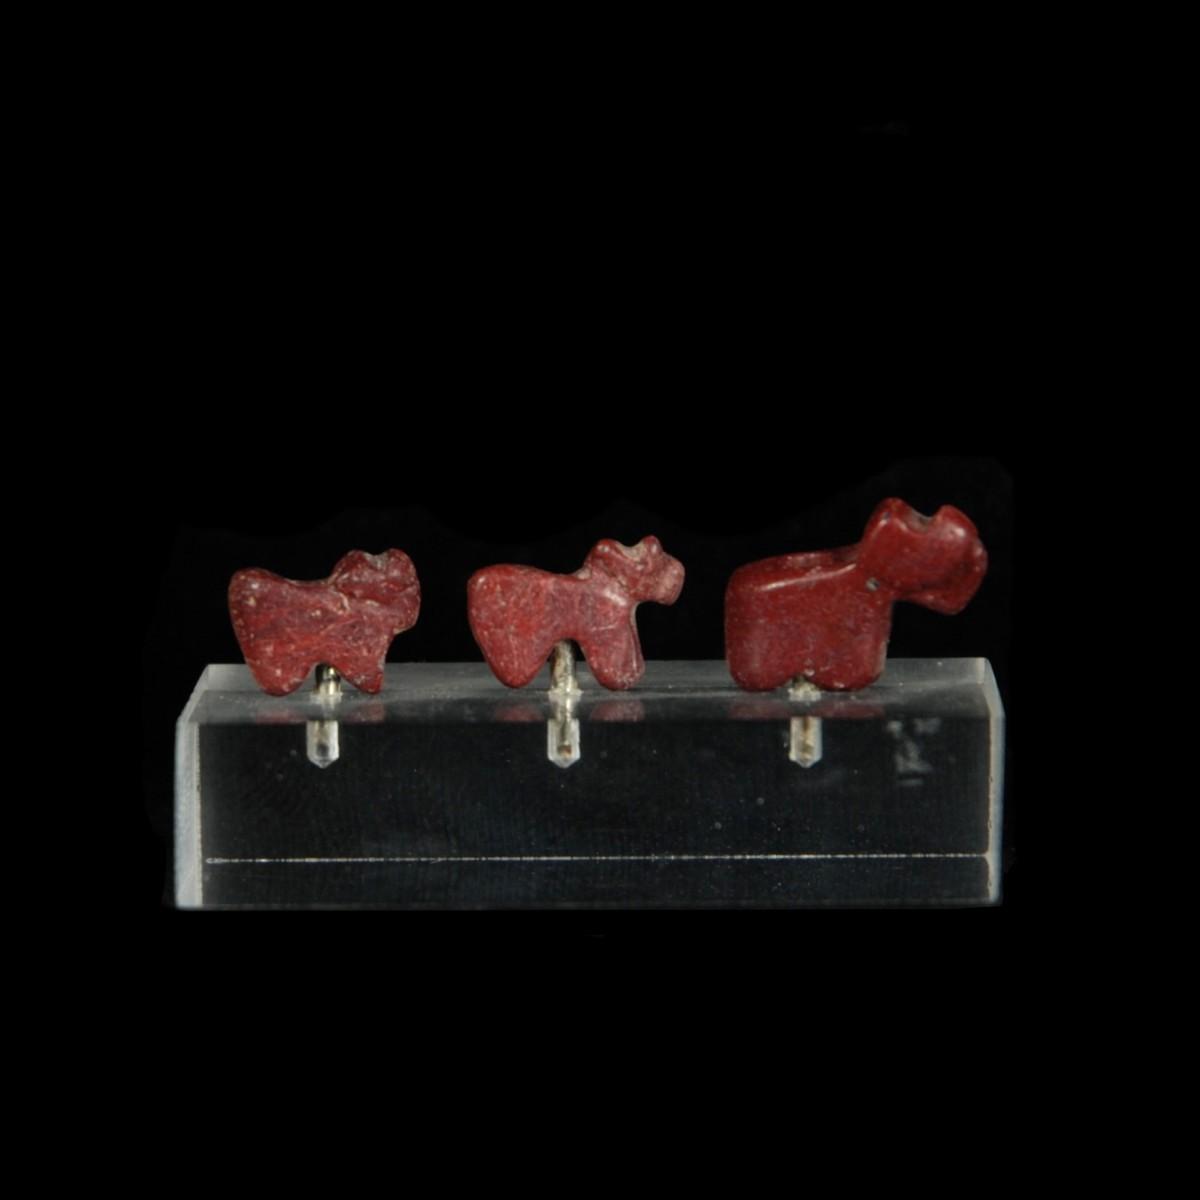 Three Sumerian red jasper ram amulets